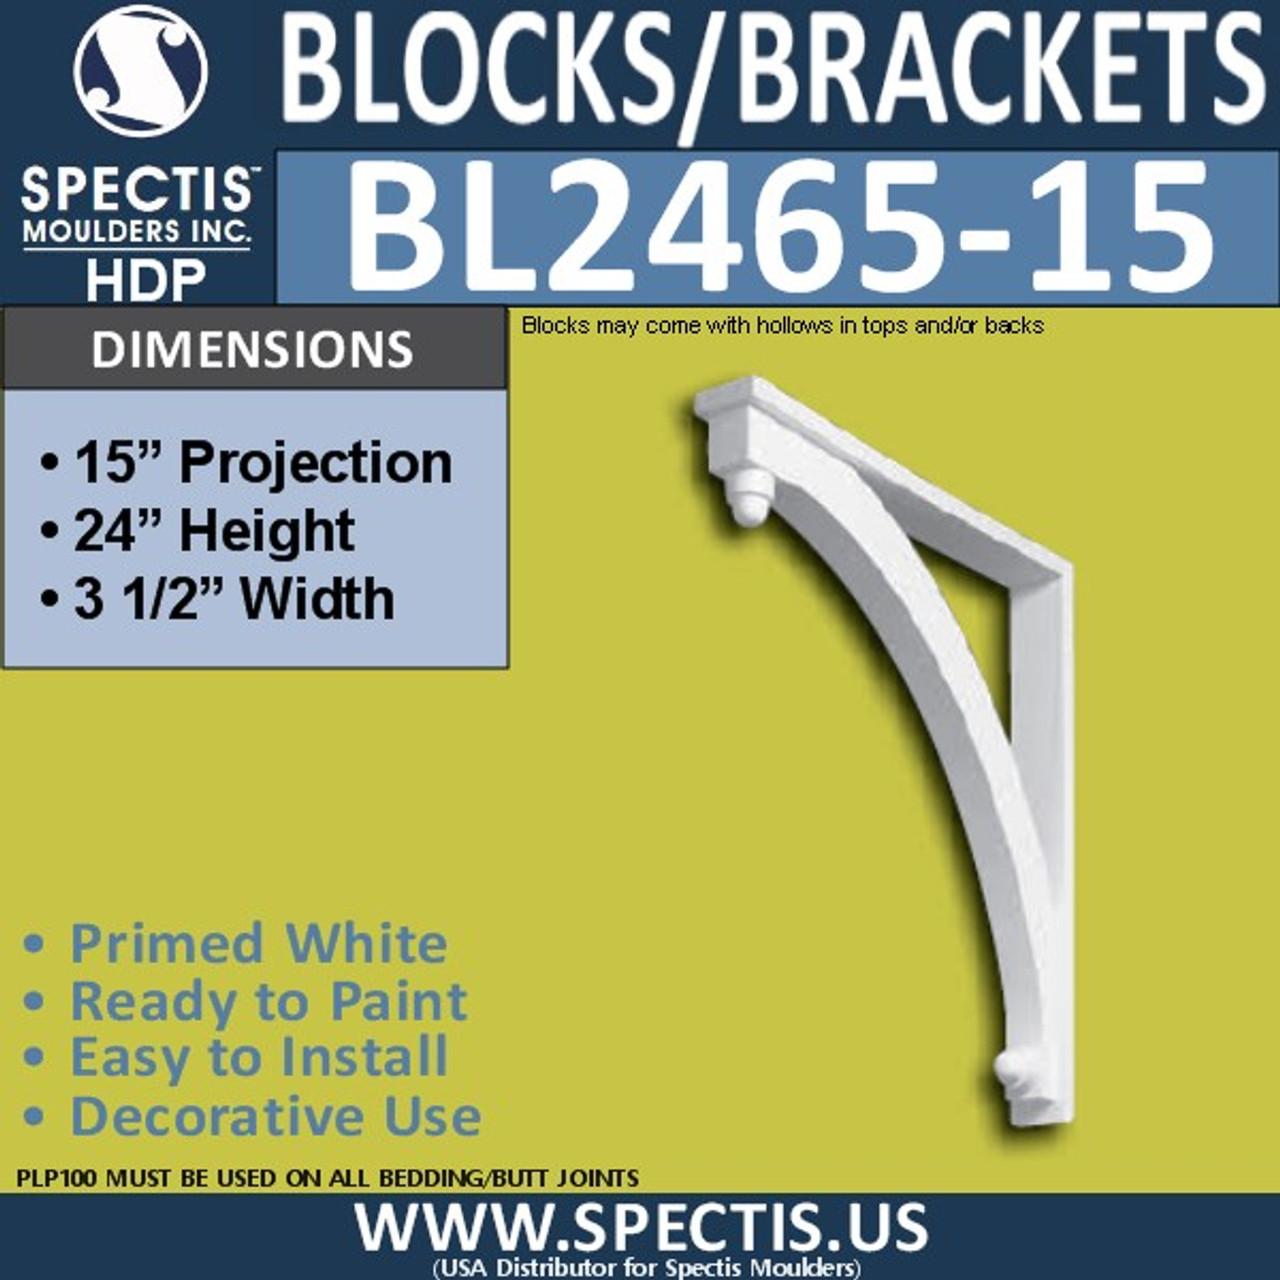 "BL2465-15 Eave Block or Bracket 3.5""W x 24""H x 15"" P"